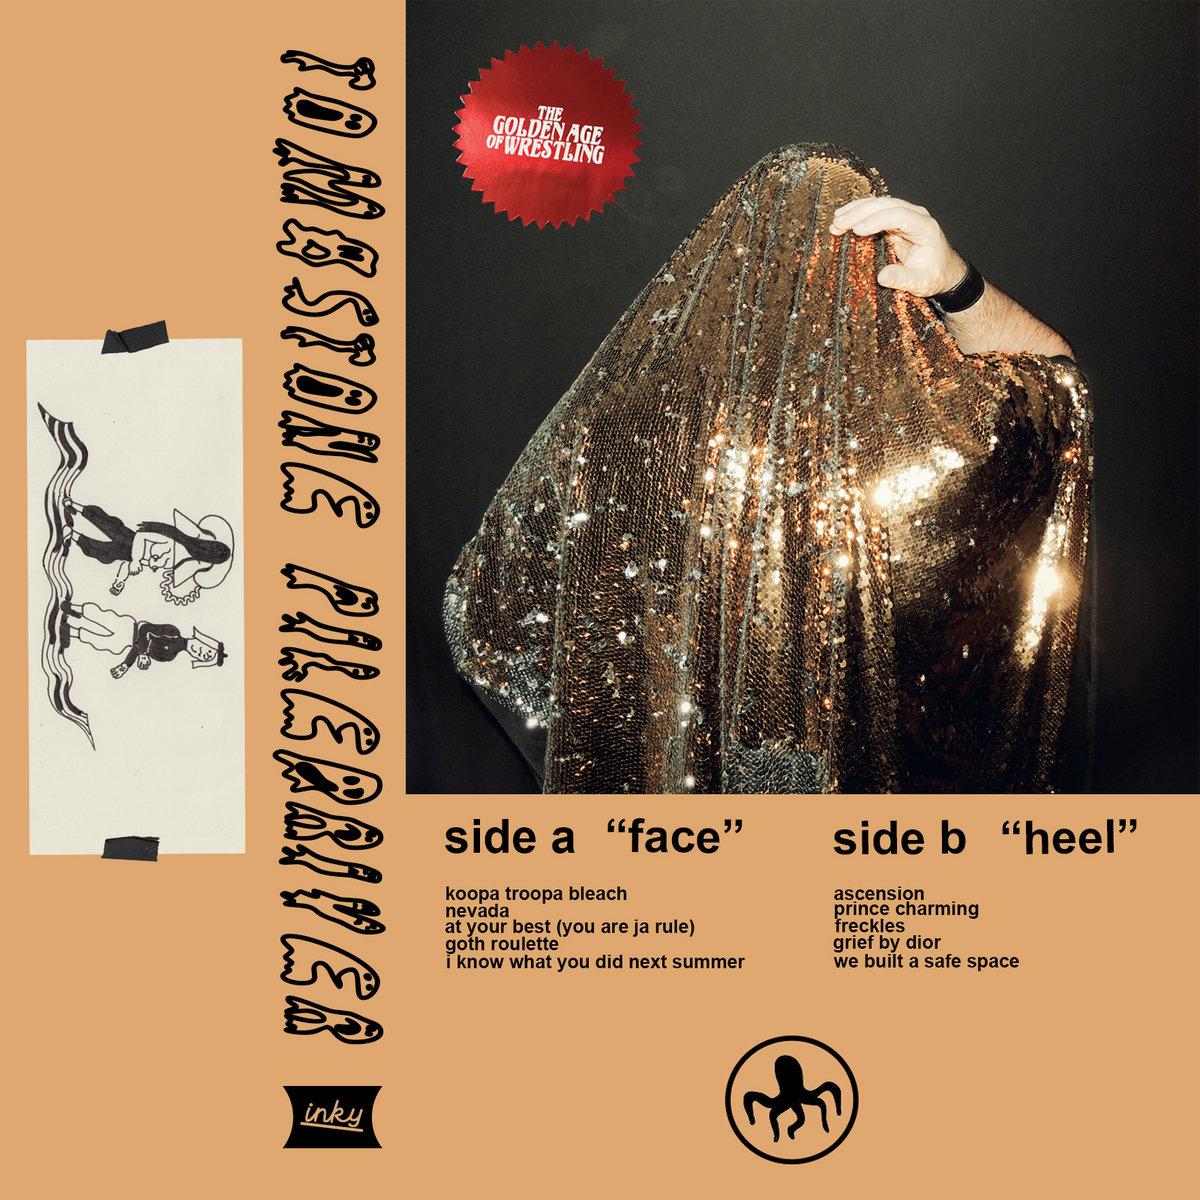 Negro Con Flaquita Latina Porno Castellano playlists | cjsf 90.1fm radio